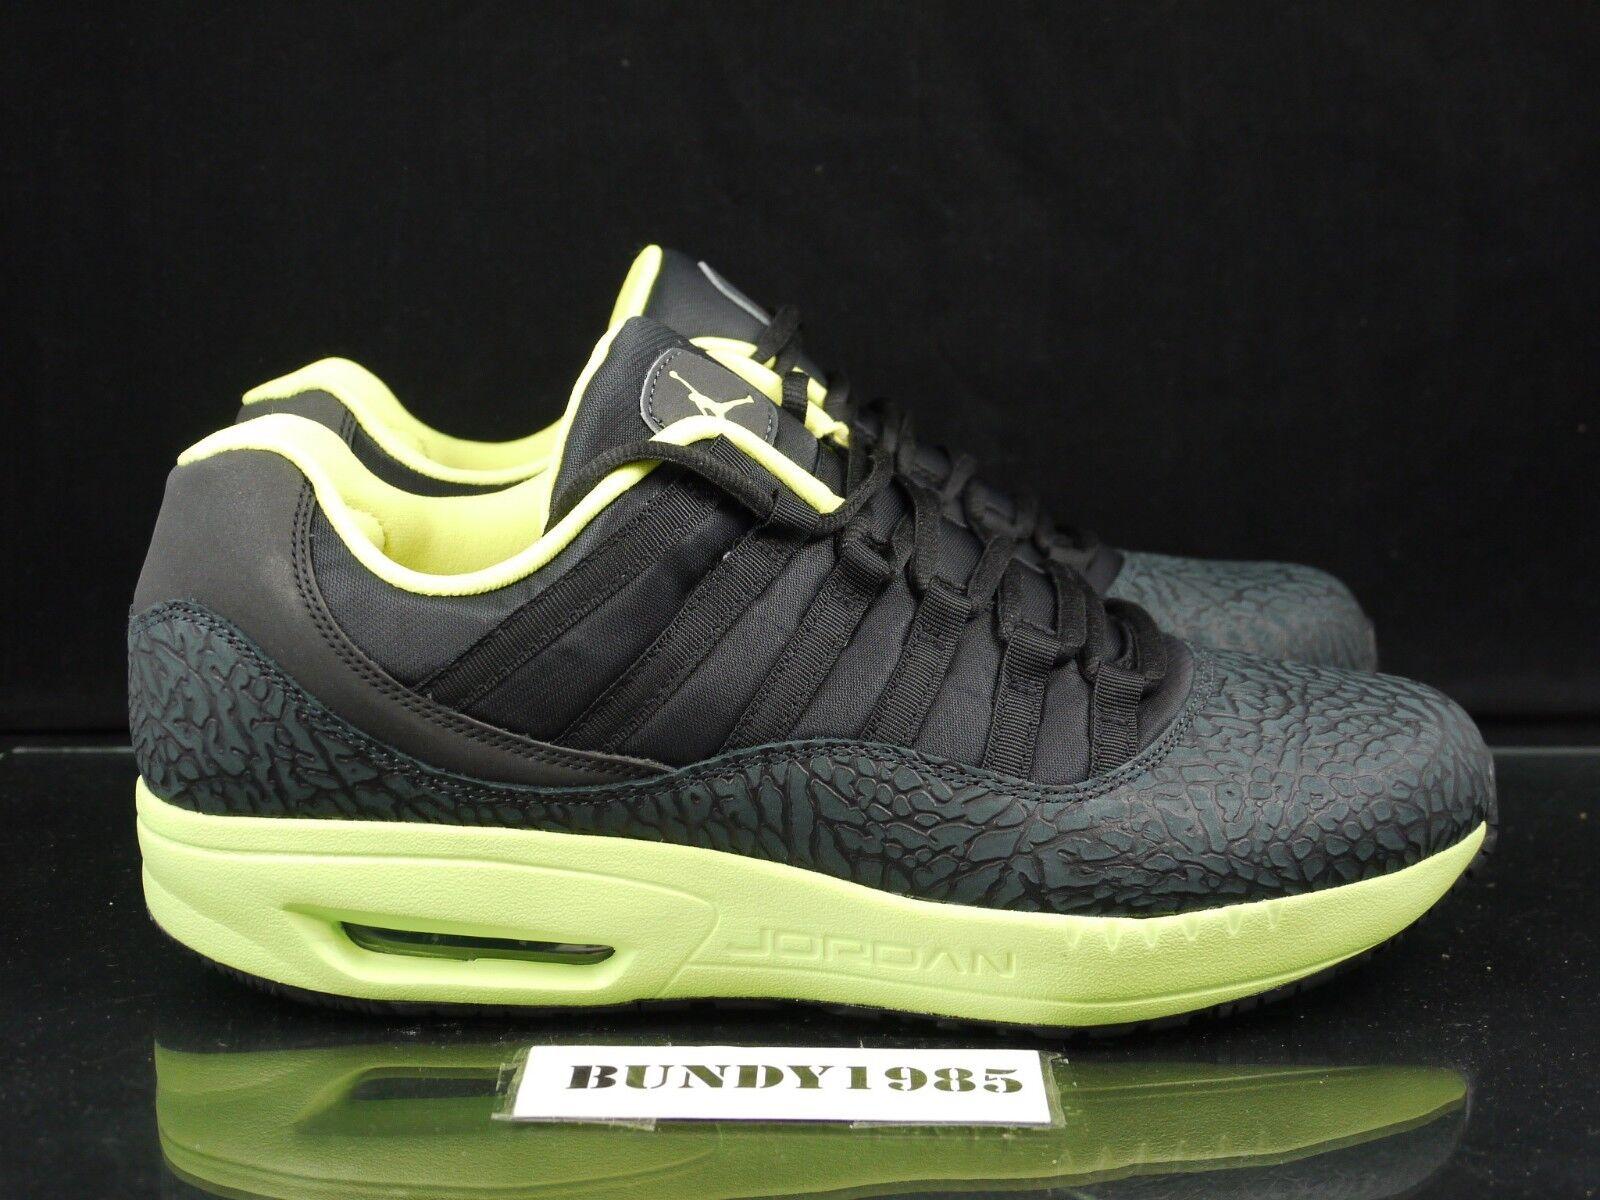 444905 001 Nike Jordan CMFT 13 Viz Air Men's SZ 11.5 Neon   Black sb dunk P